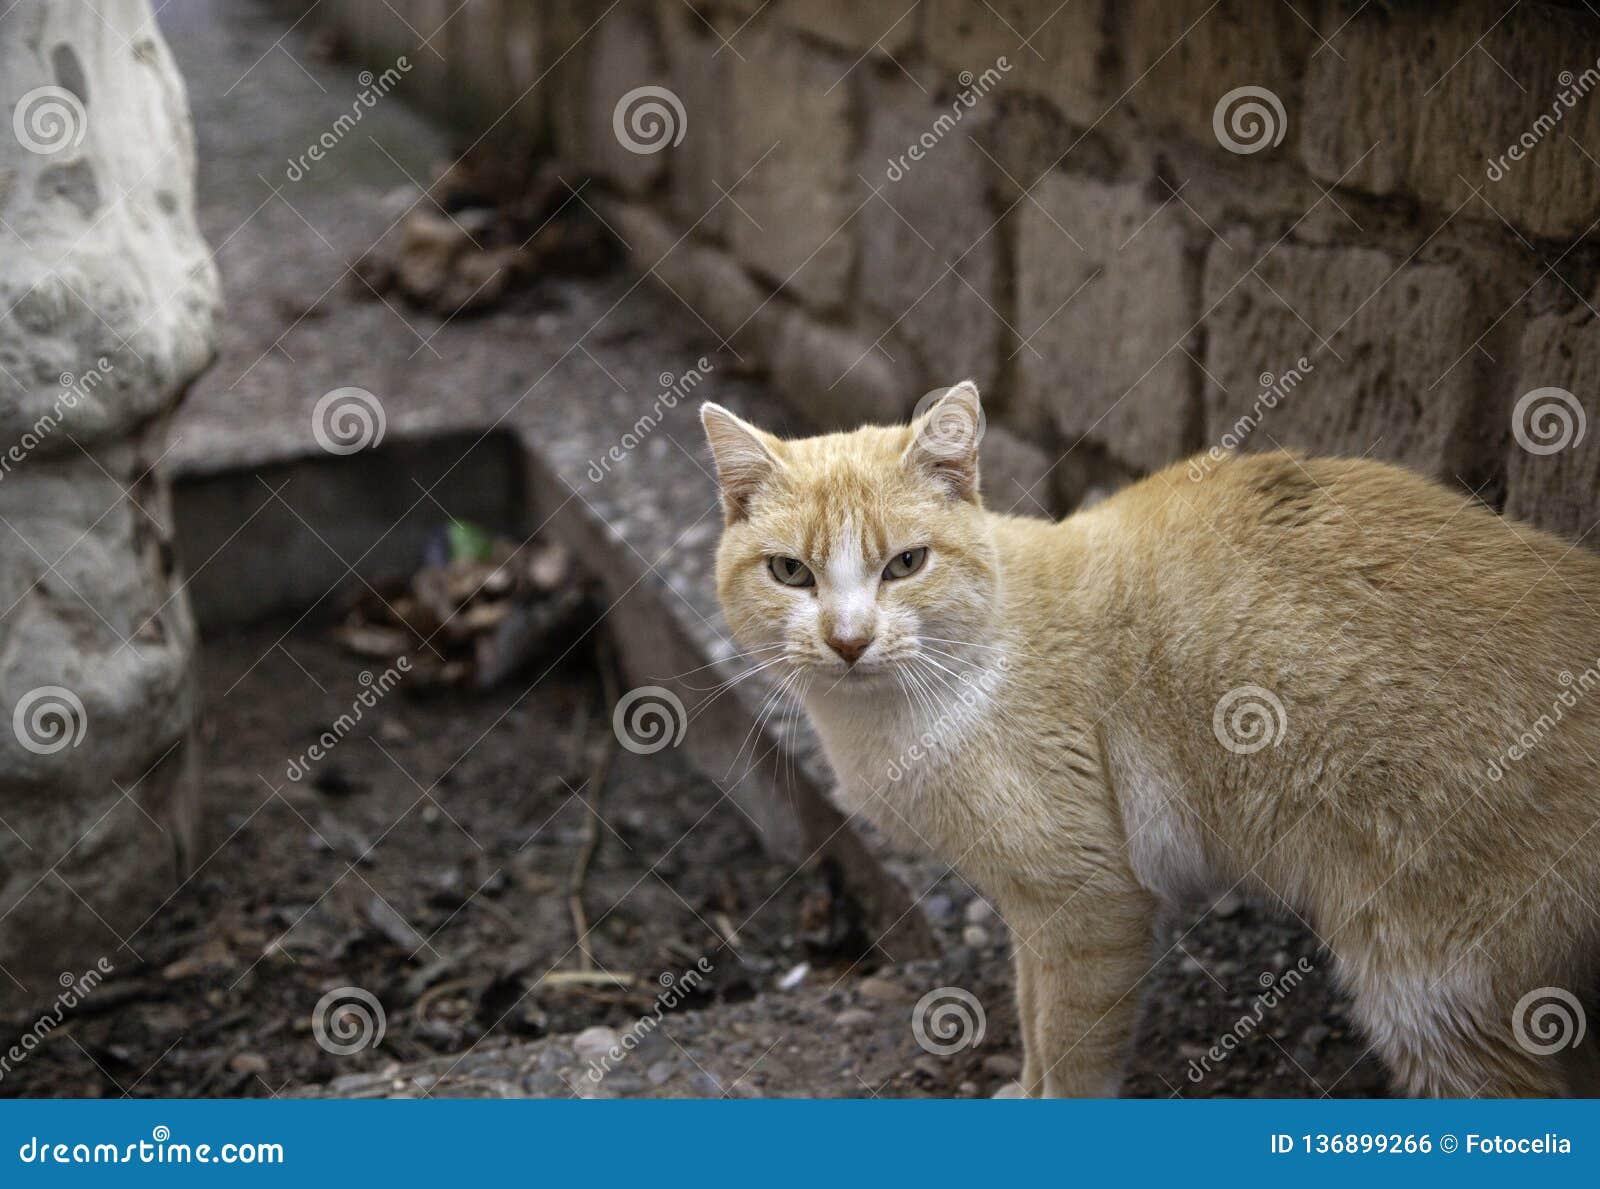 Cats abandoned street stock photo  Image of nature, black - 136899266